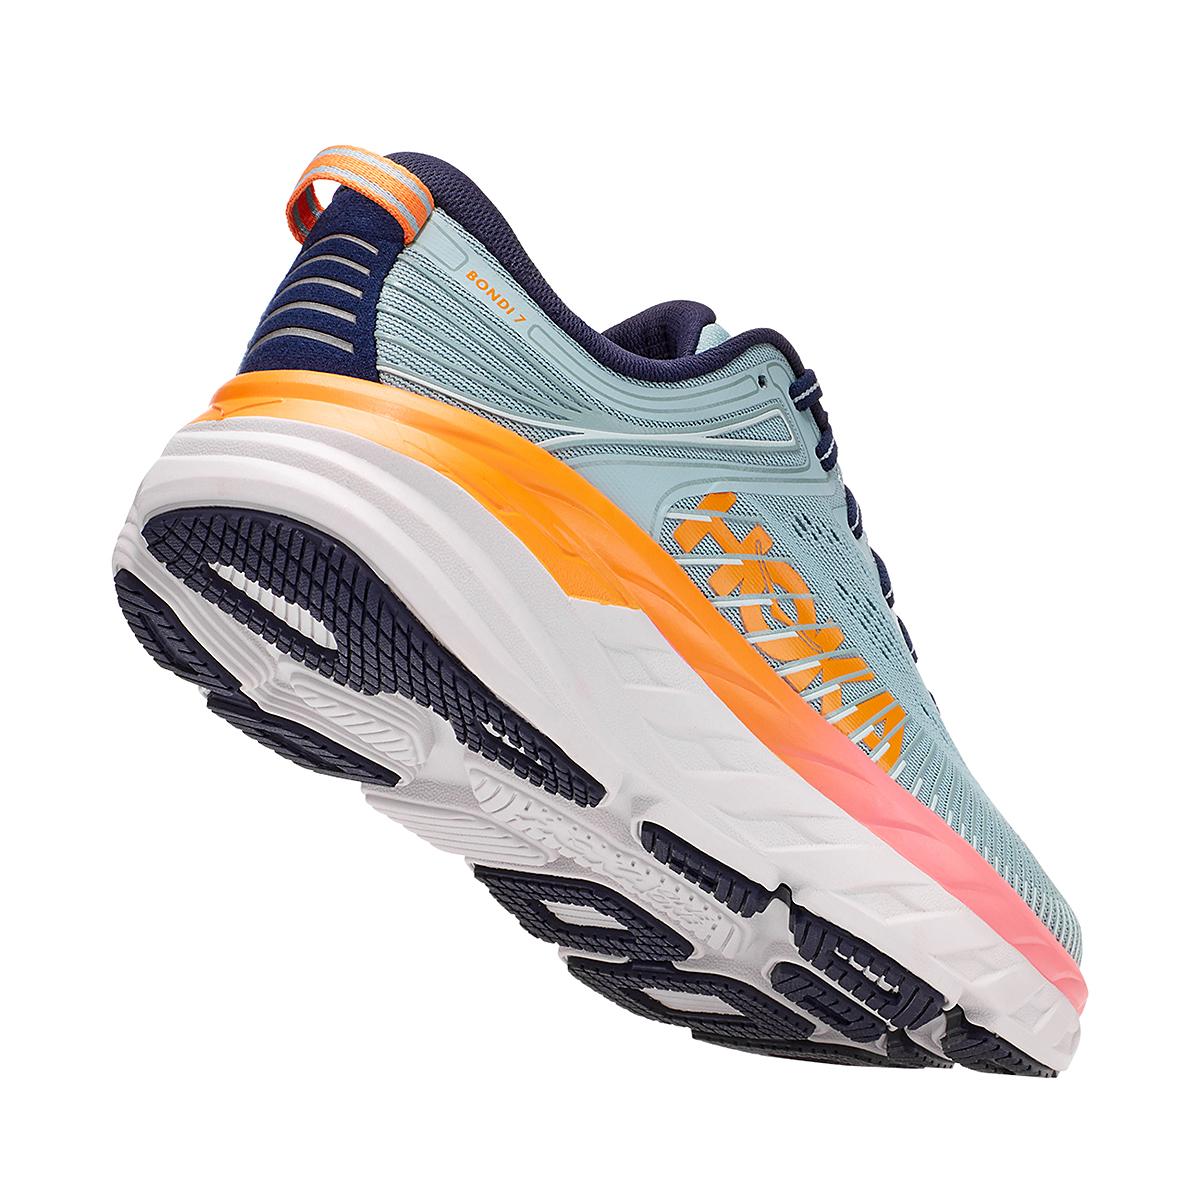 Women's Hoka One One Bondi 7 Running Shoe - Color: Blue Haze/Black Iris - Size: 5.5 - Width: Regular, Blue Haze/Black Iris, large, image 5